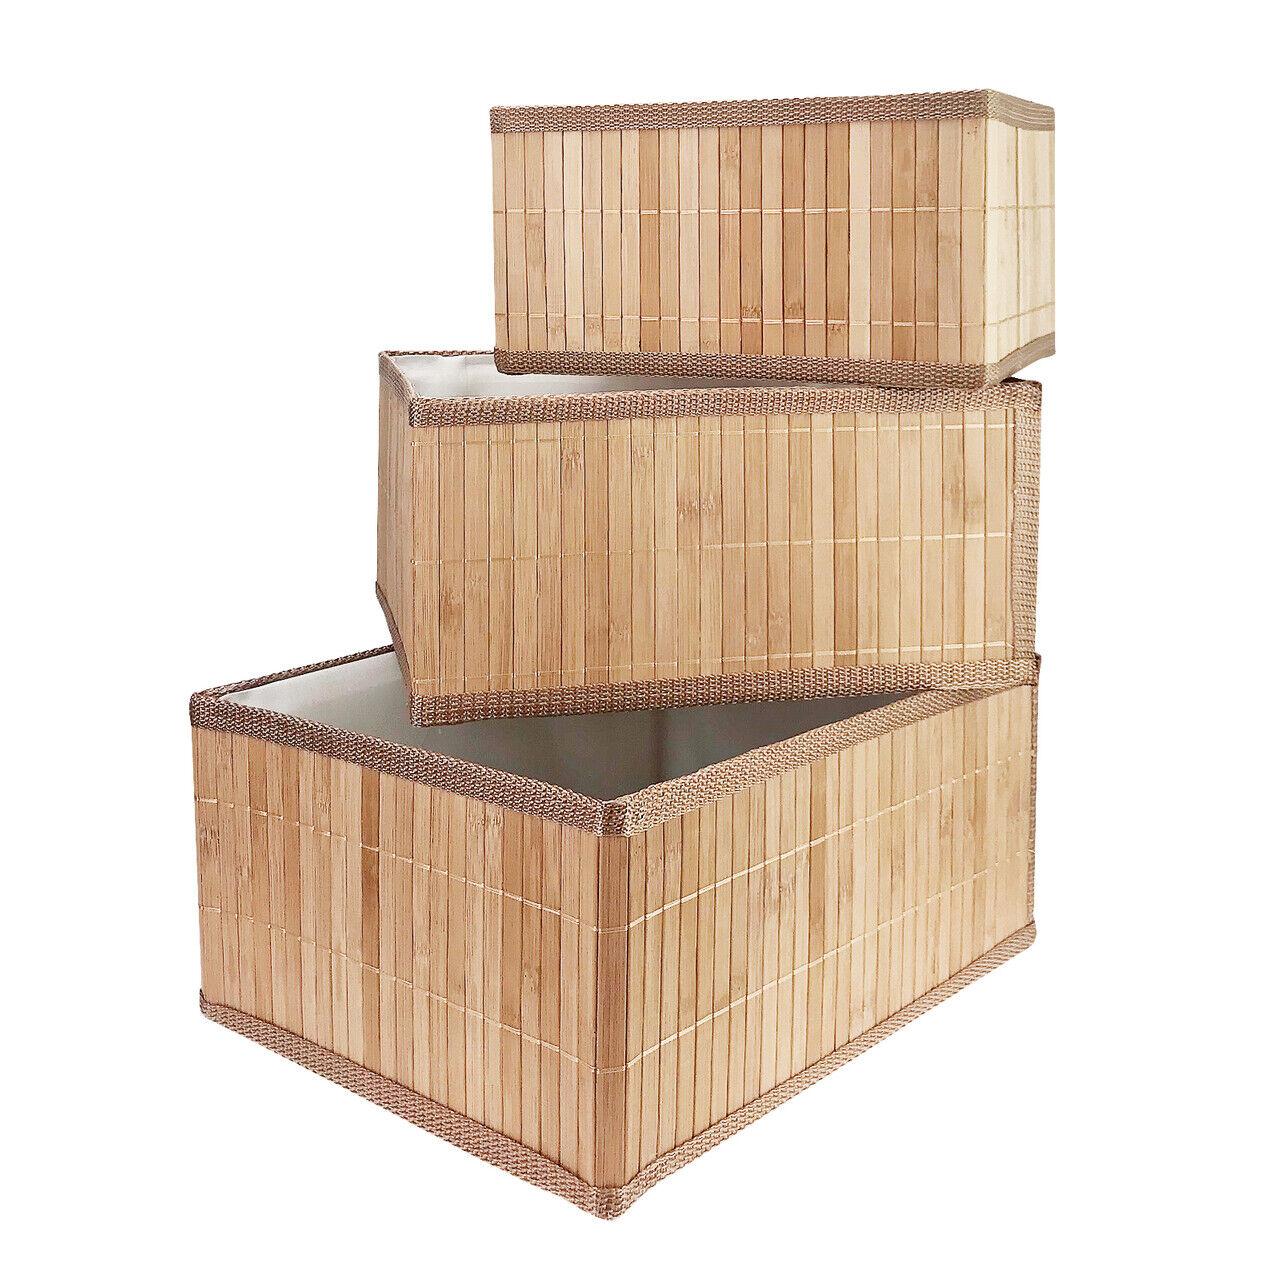 3-tlg. Set Aufbewahrungsboxen Bambus Ordnung Kiste Box Deko Regal Korb Behälter